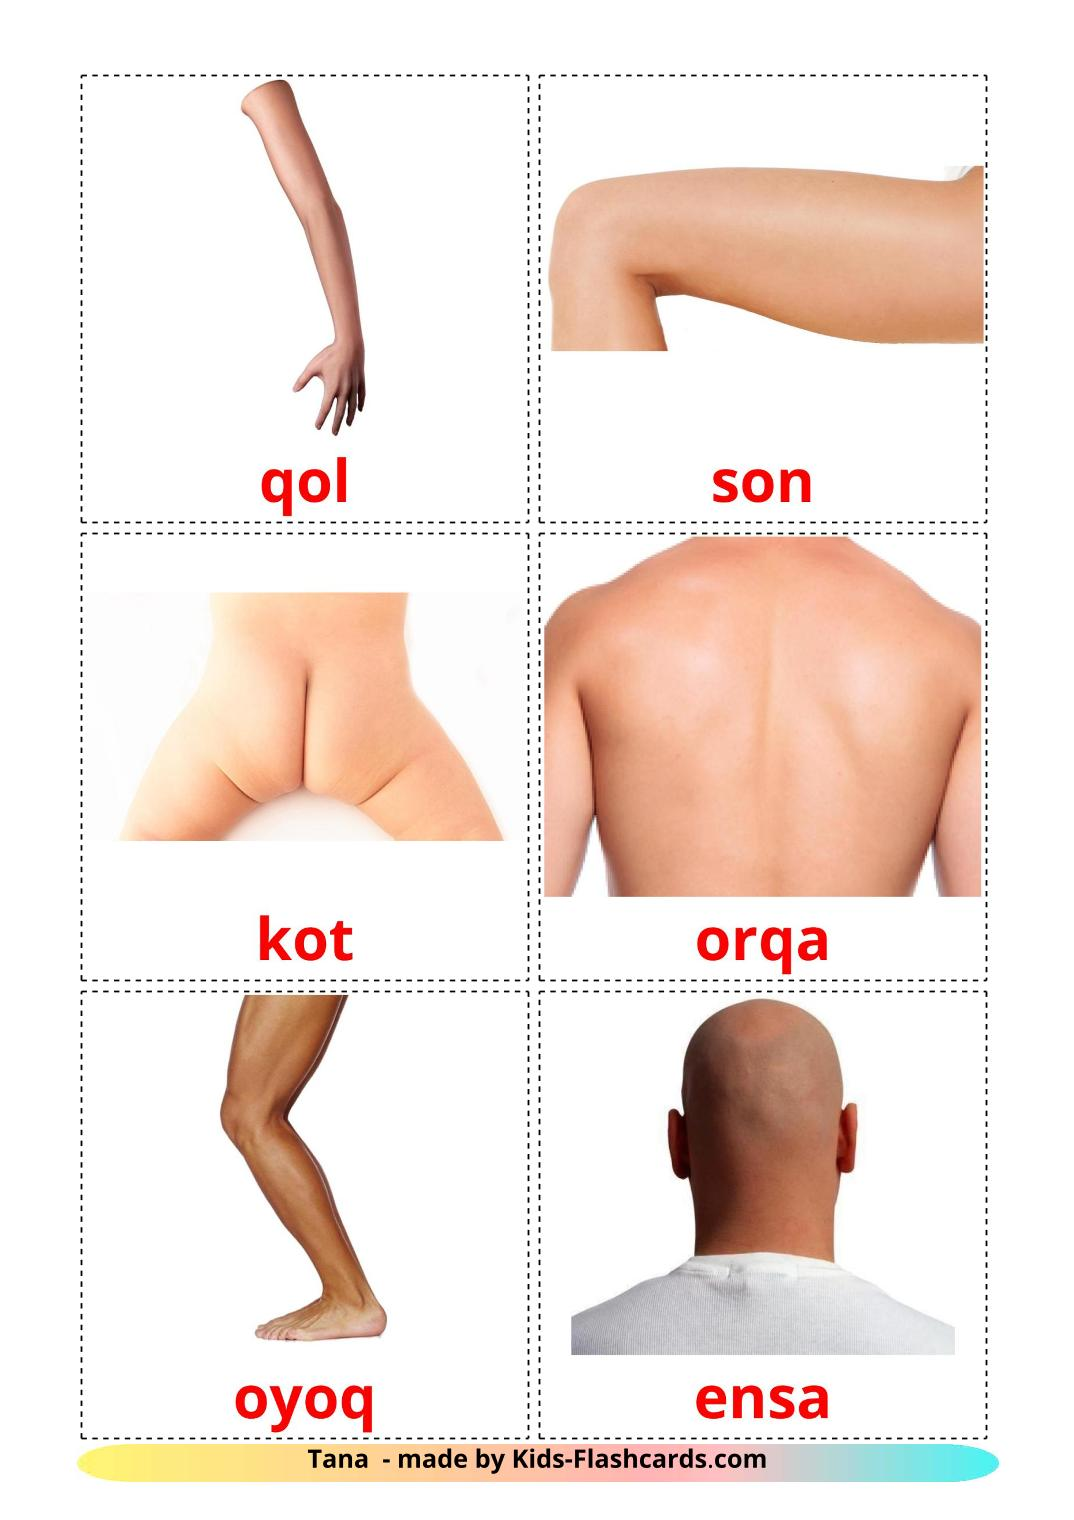 Body Parts - 26 Free Printable uzbek Flashcards